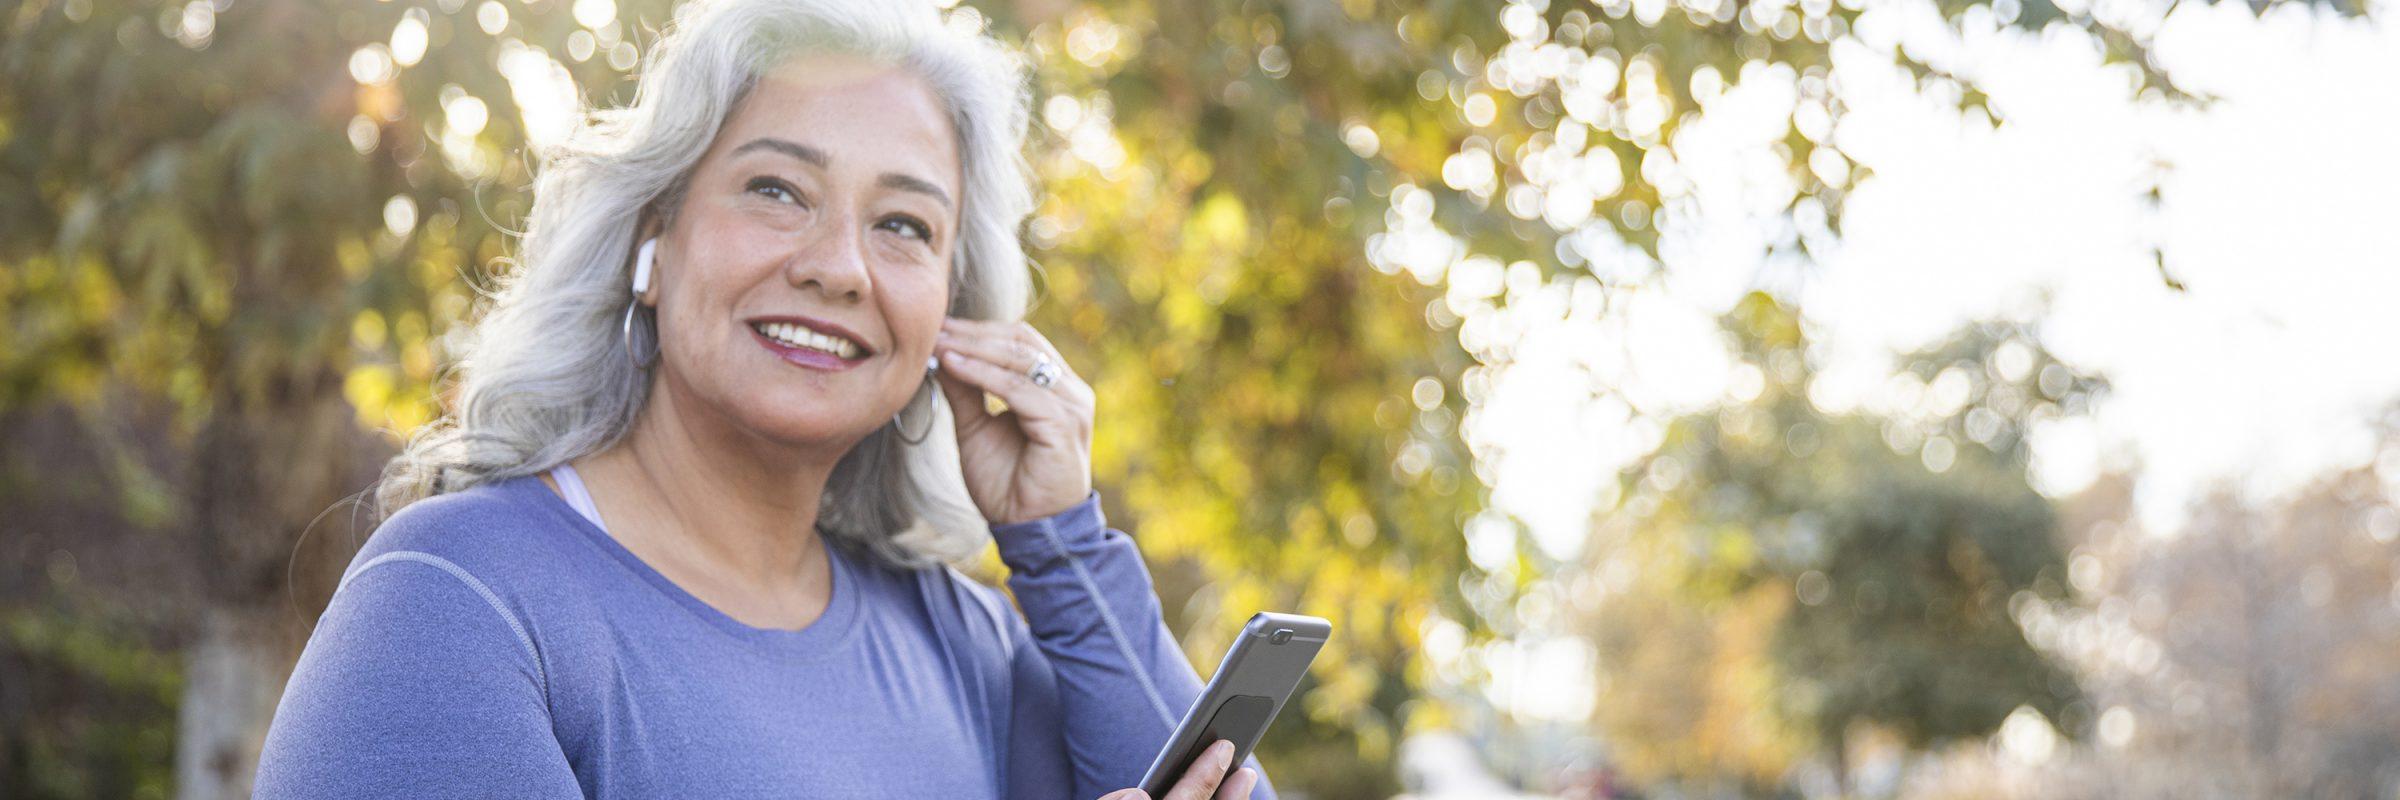 Frau mit Kopfhörer macht Sport über App